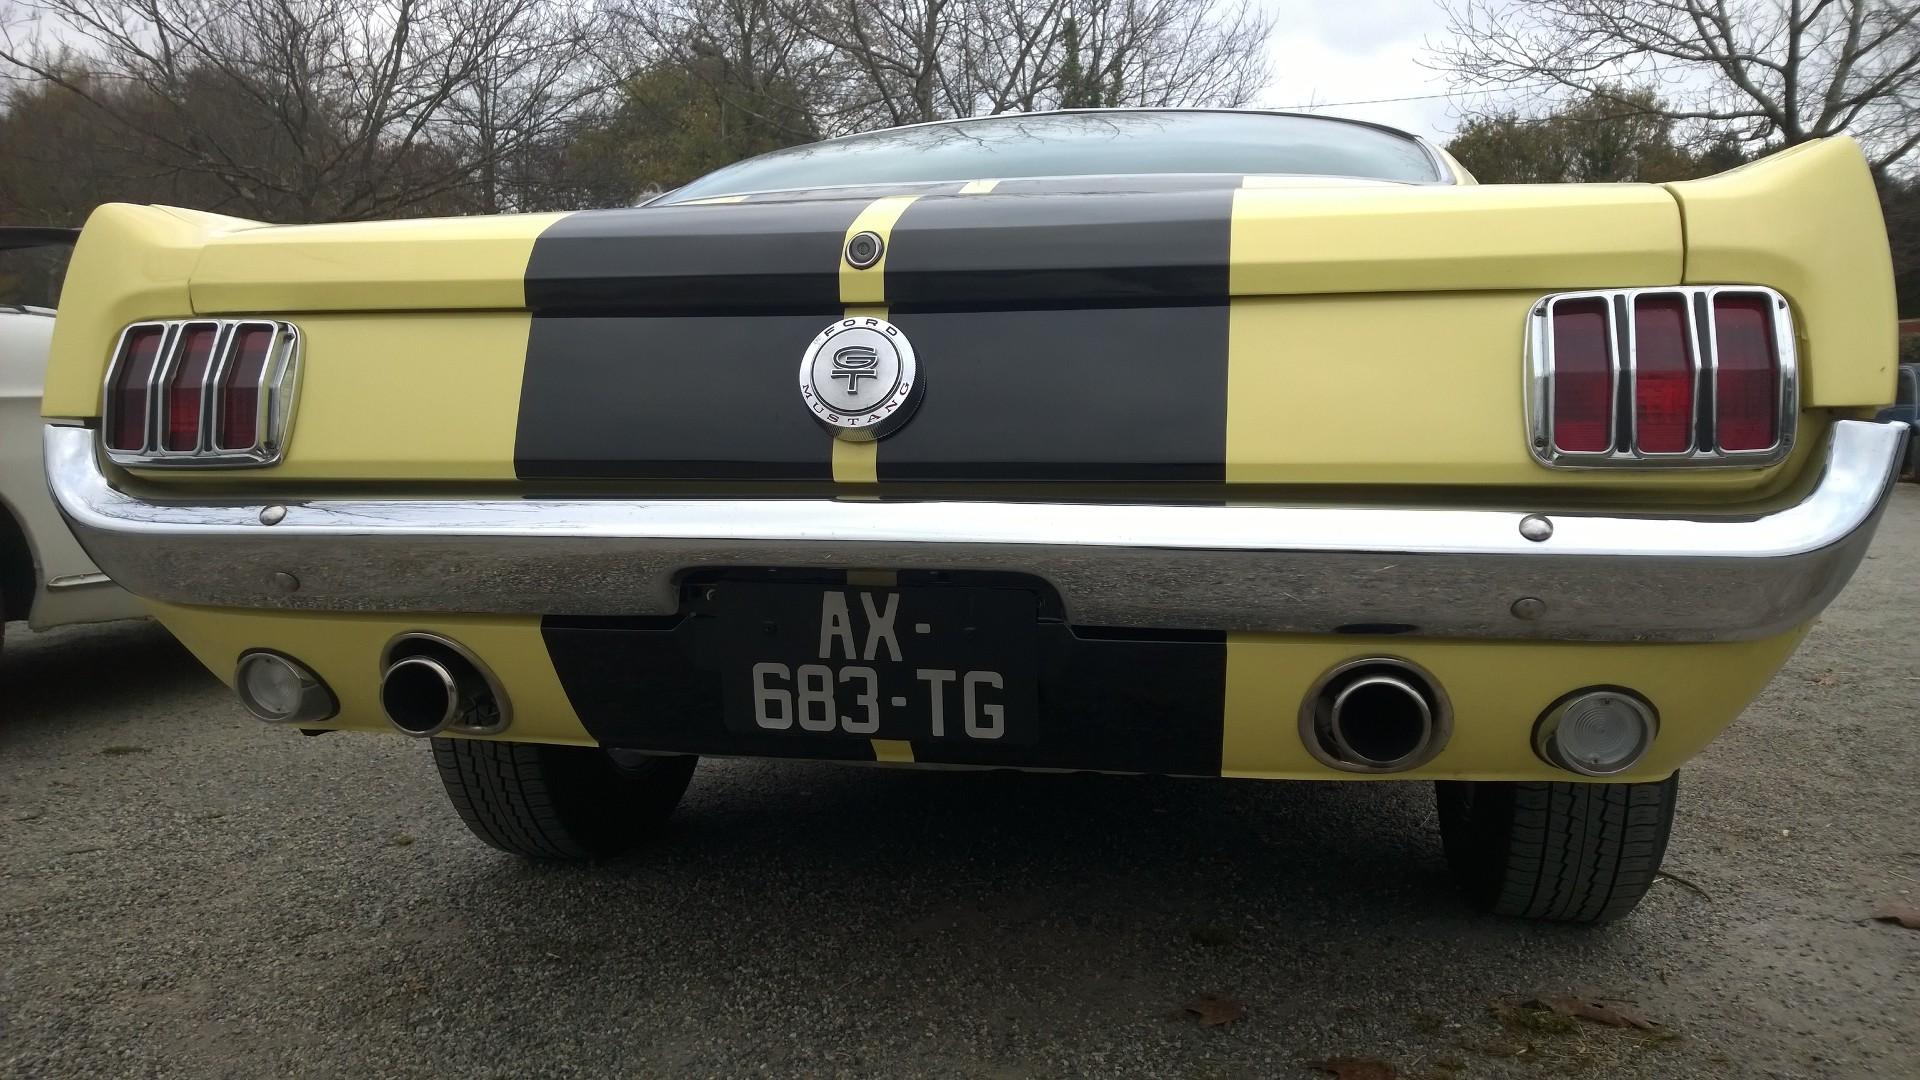 DM - photo - 1960s Mustang - arriere / rear - Ouest Motors Festival 2015 Lorient